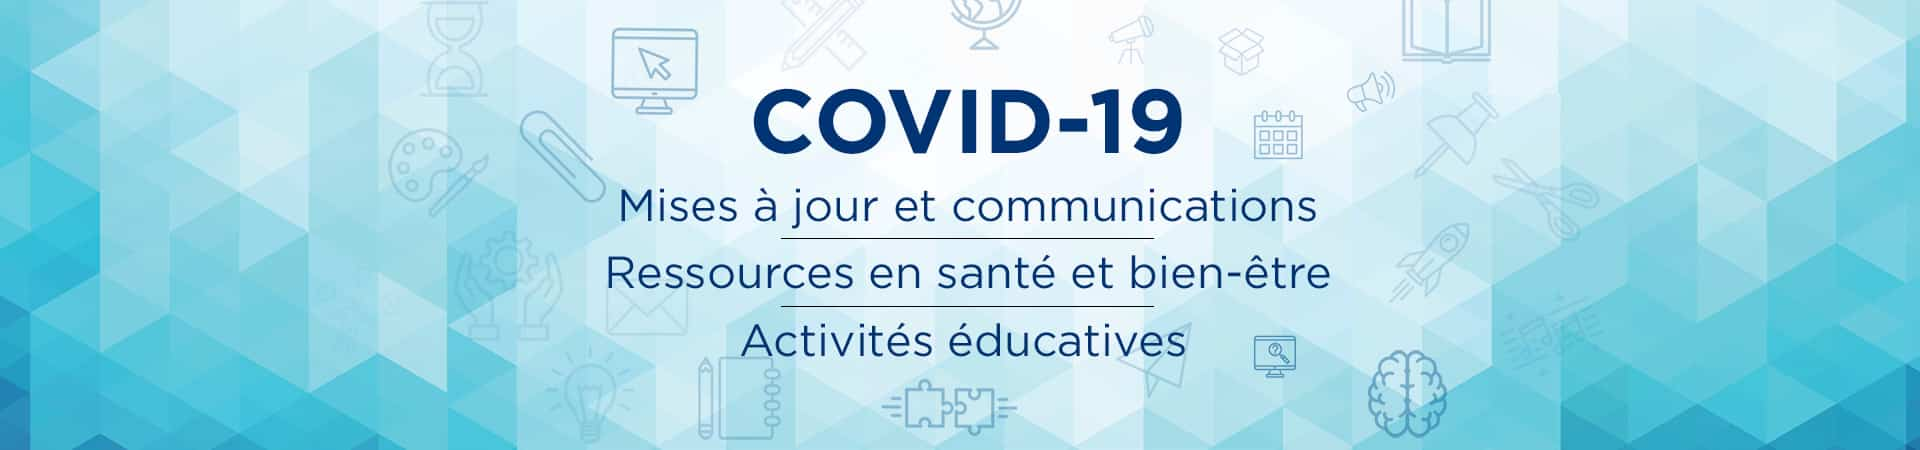 Information sur COVID-19